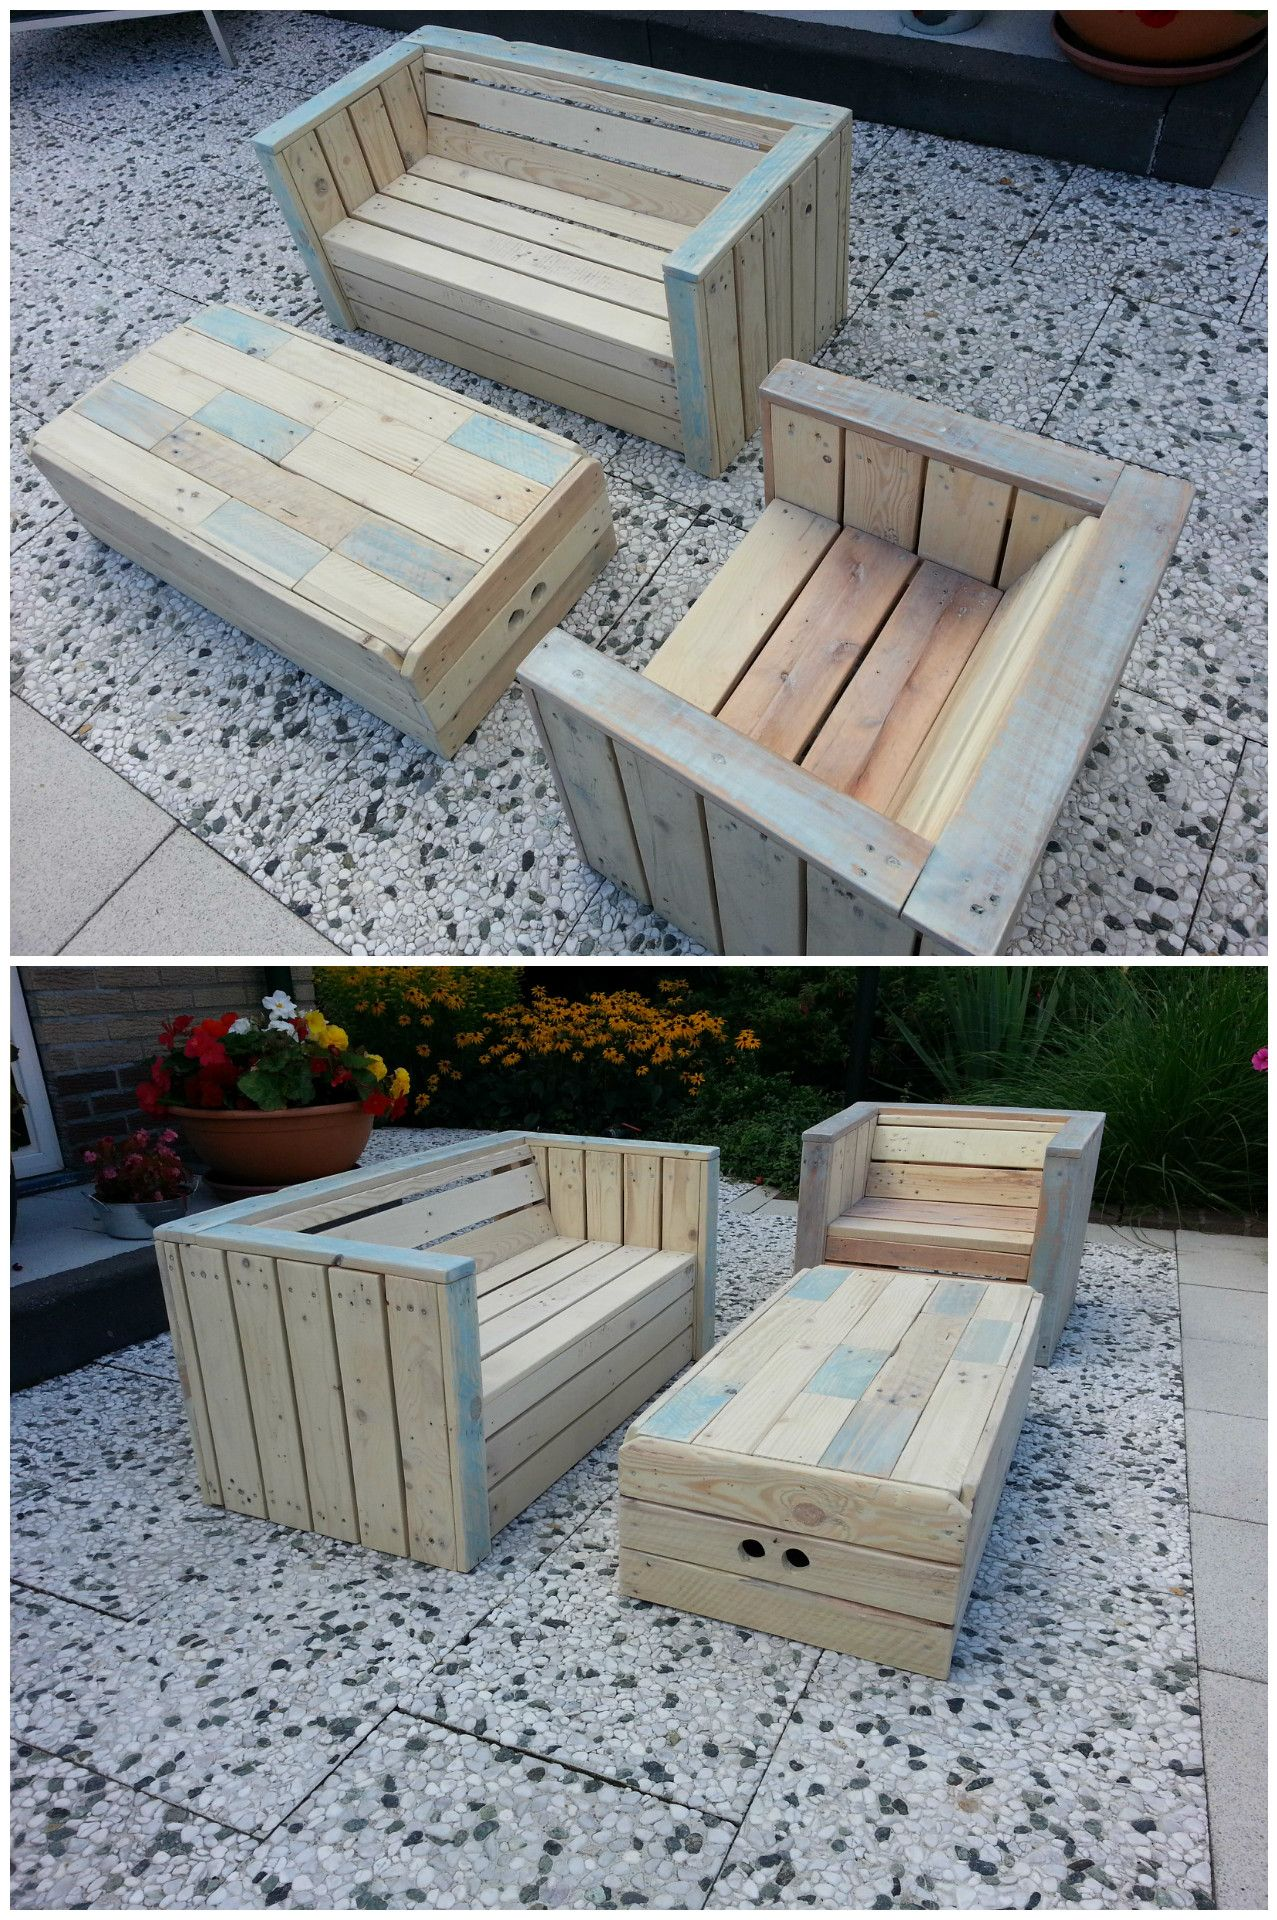 Complete Pallet Garden Set Pallet Ideas 1001 Pallets: Little Children Lounge Set Out Of Recycled Pallets